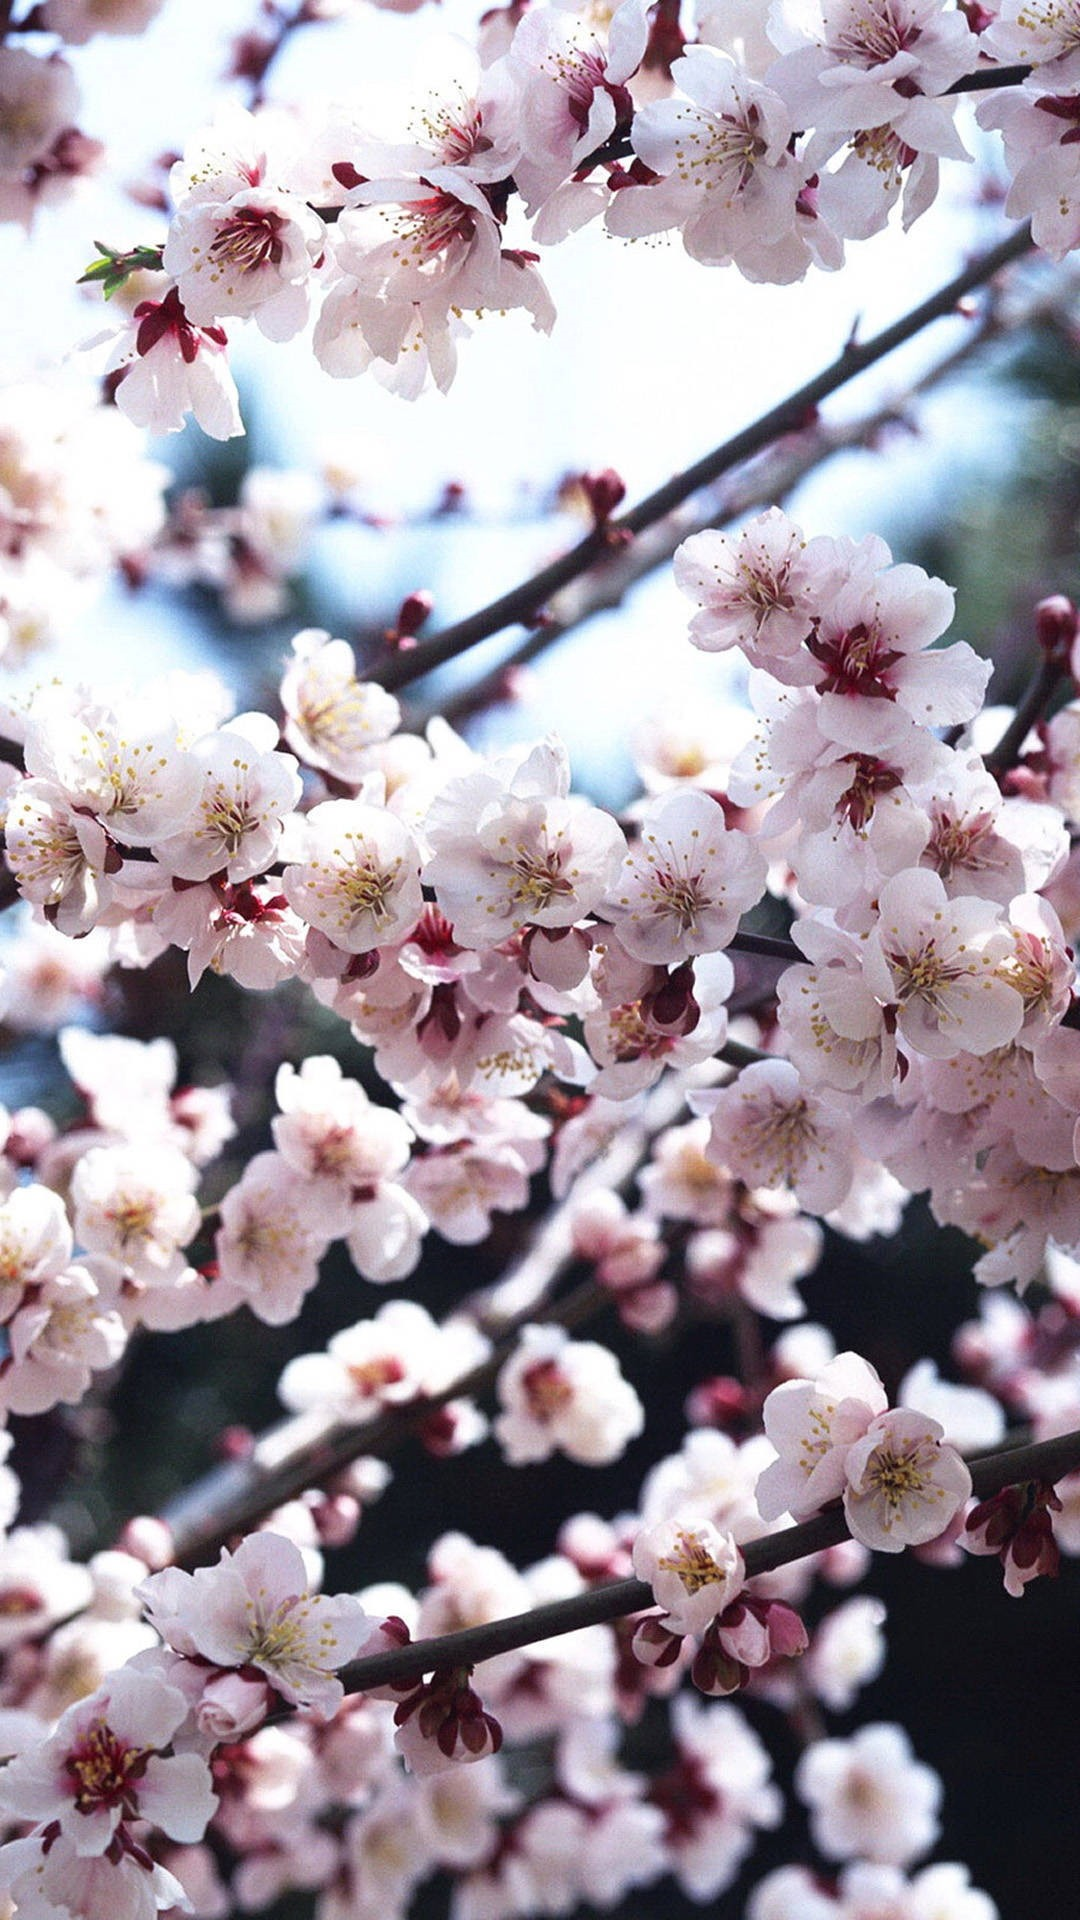 Cherry Blossom iphone home screen wallpaper